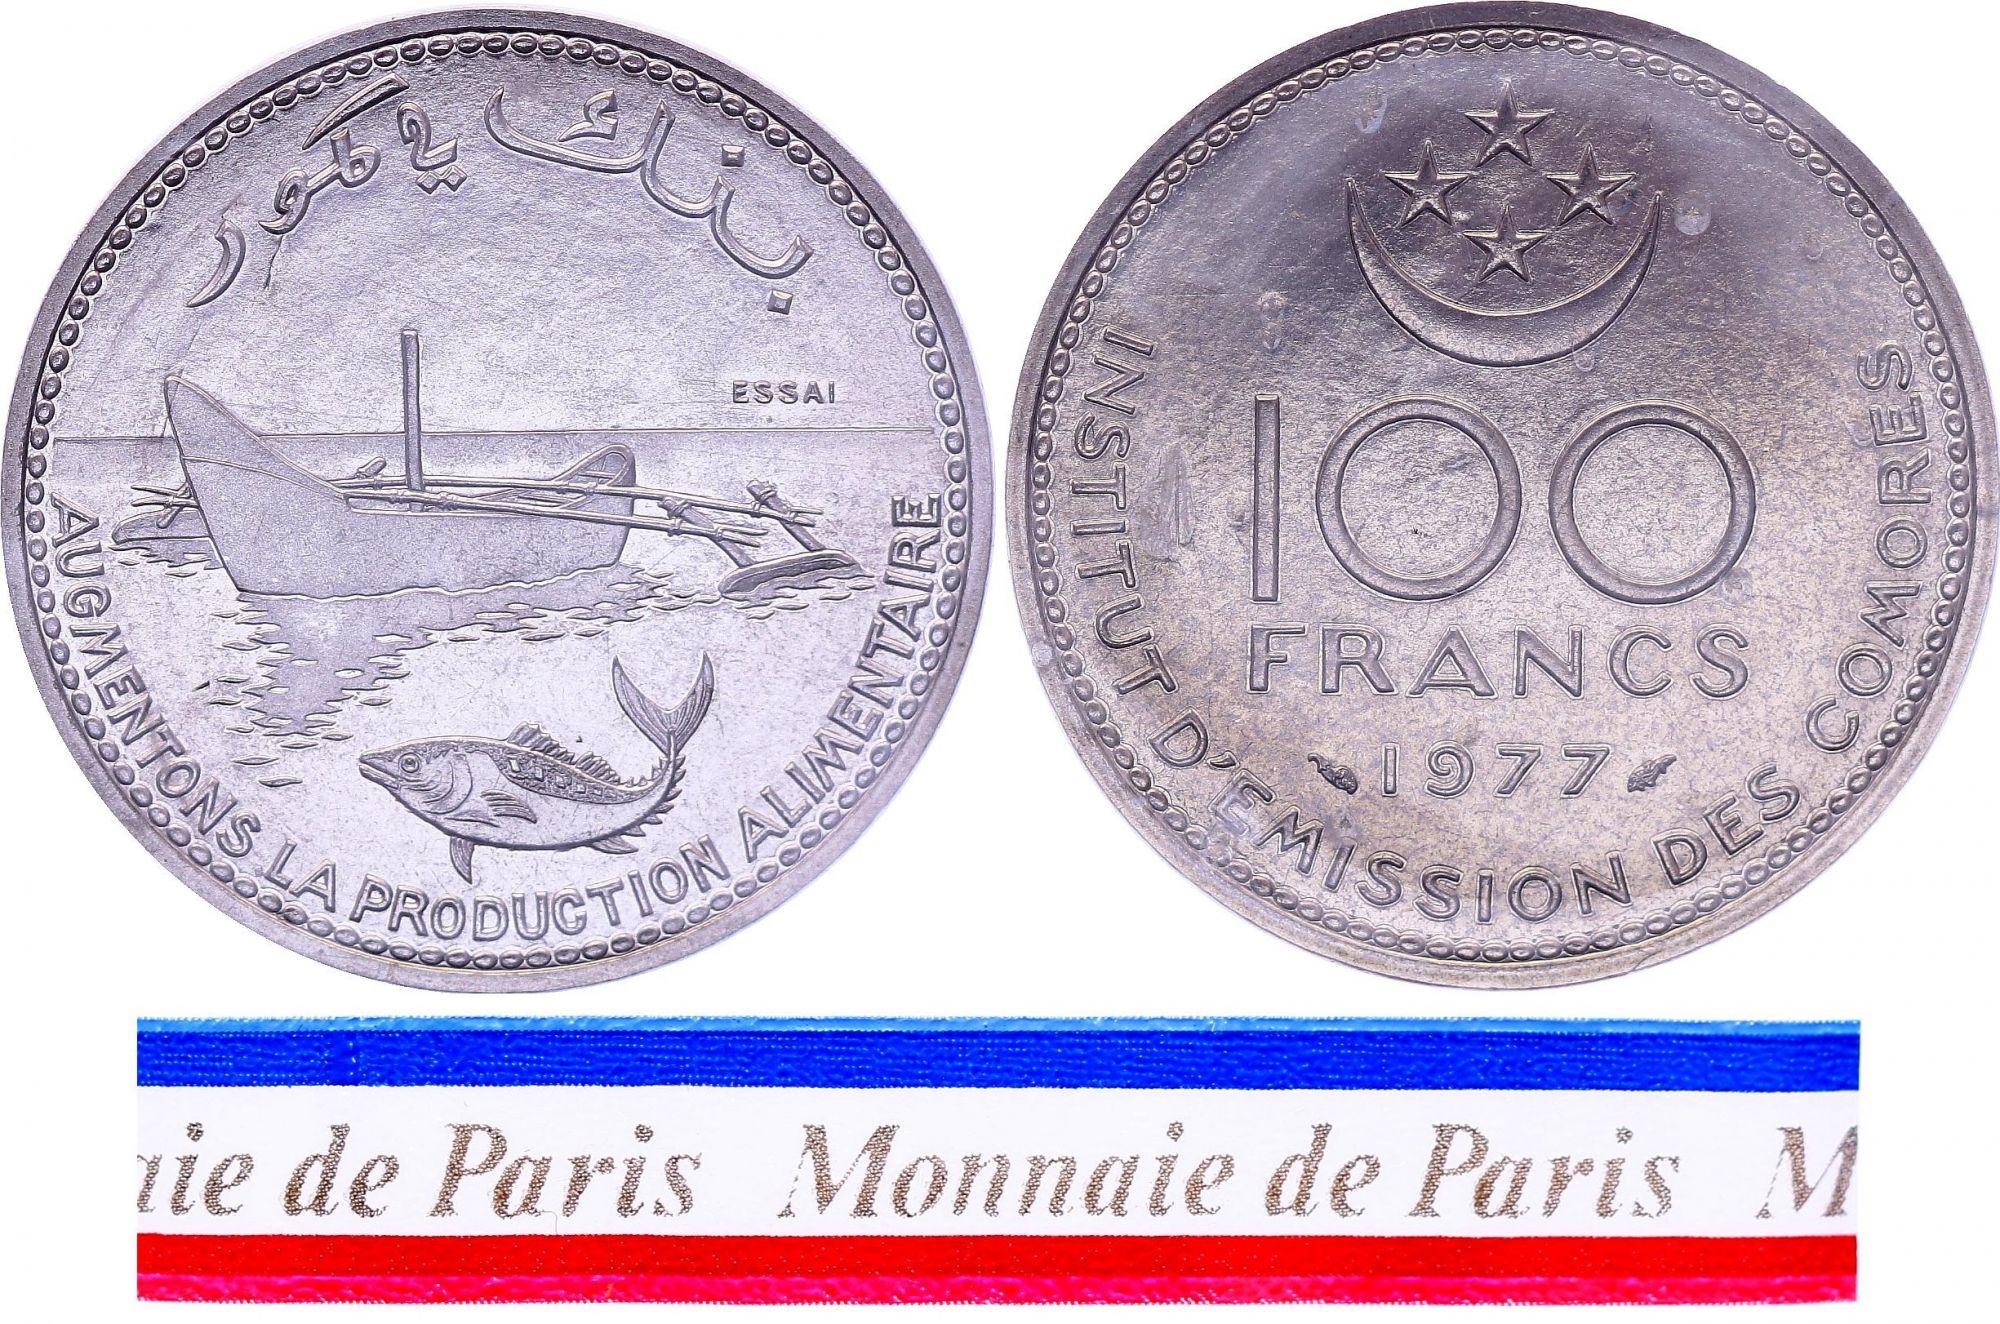 Comoros 100 Francs - 1977 - Test Strike - Issuing Institute of Comoros